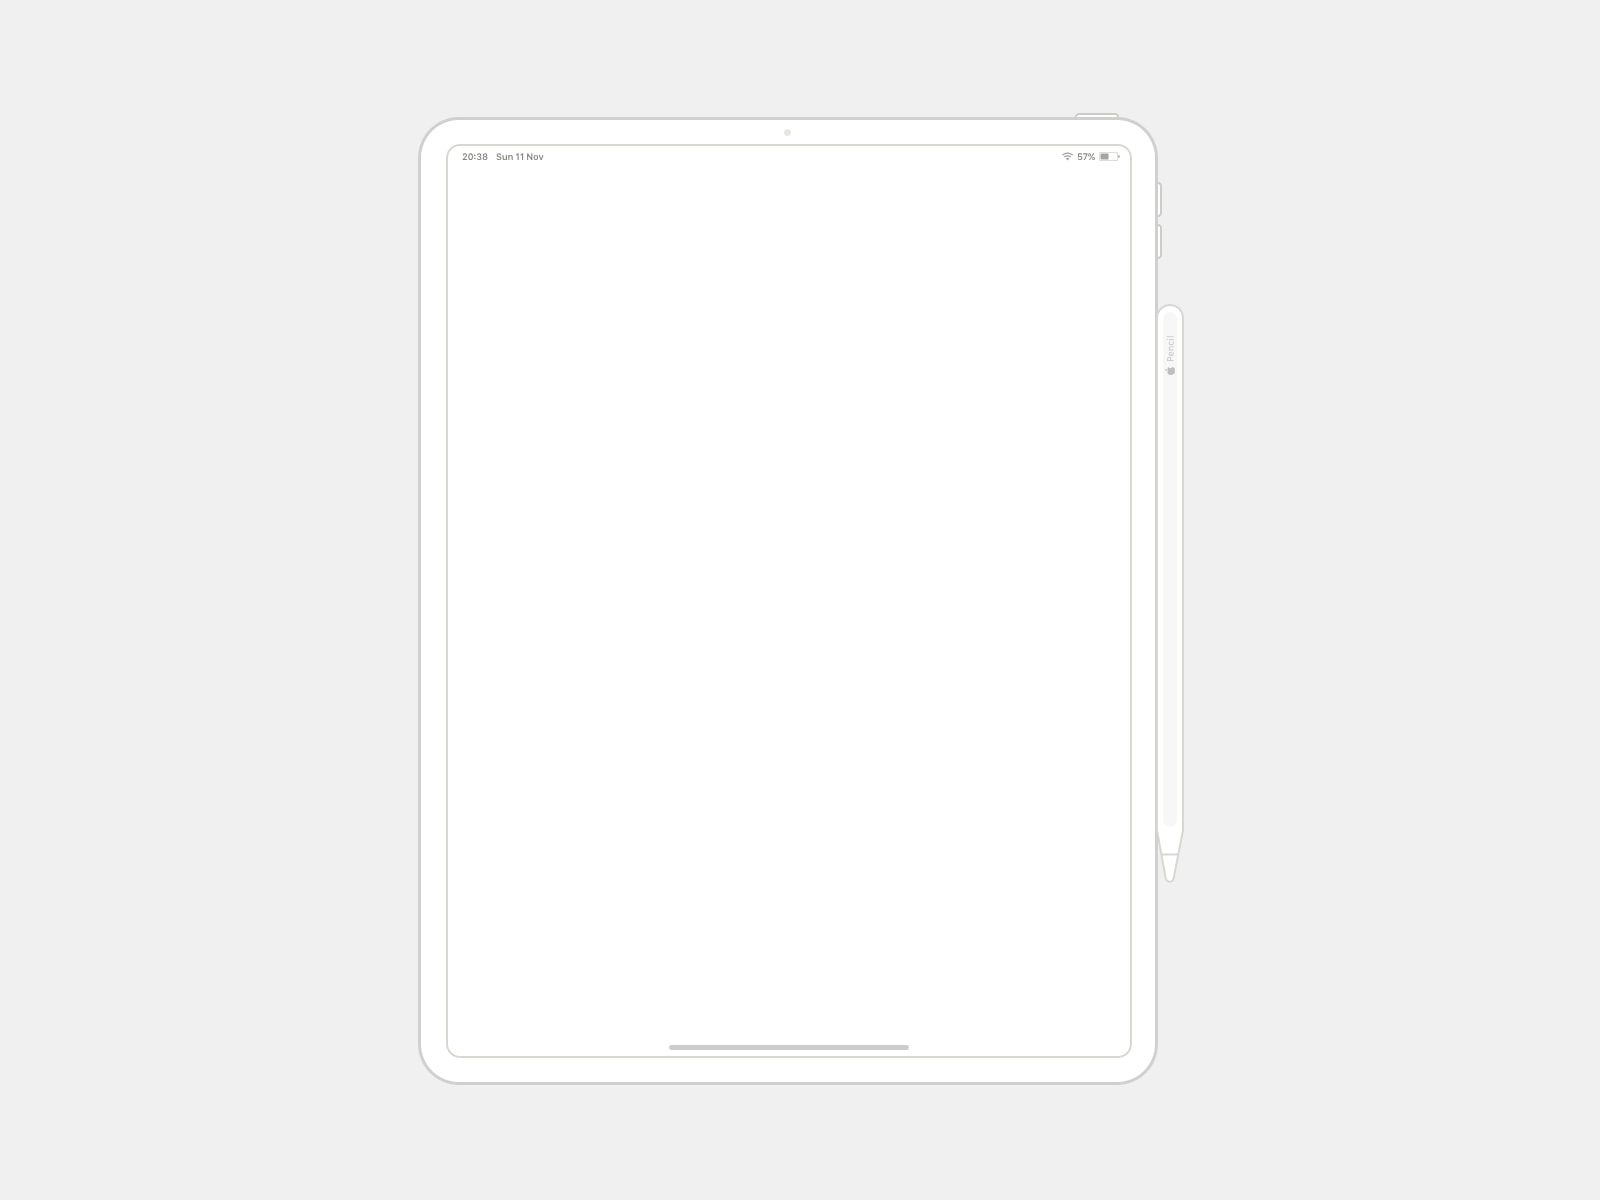 iPad Pro 12.9 Wireframe Mockup from UIGarage